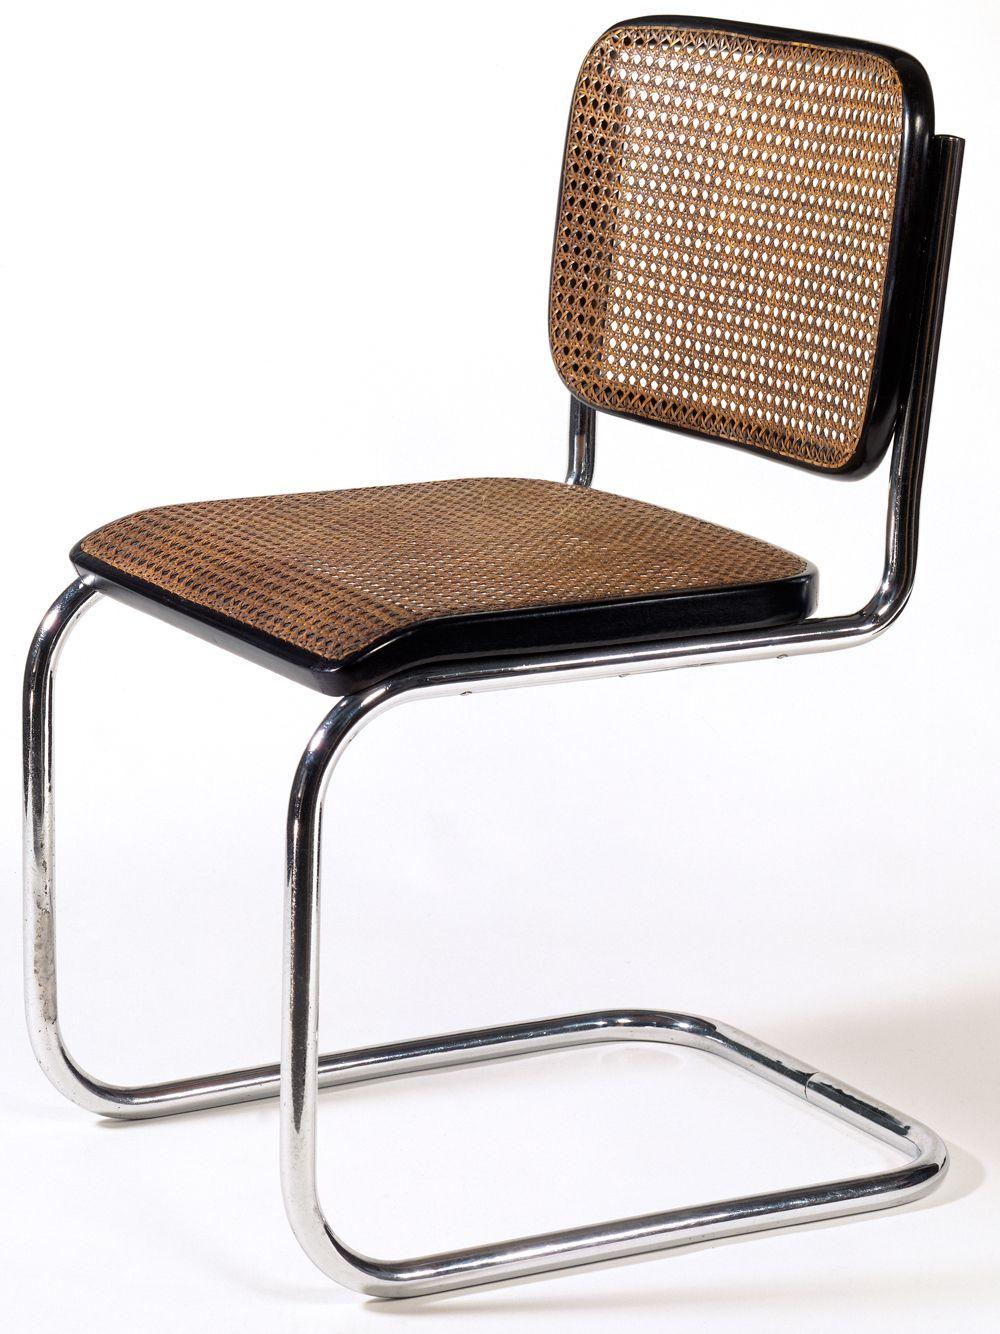 Chair, model B32, Marcel Breuer, Made by Gebrüder